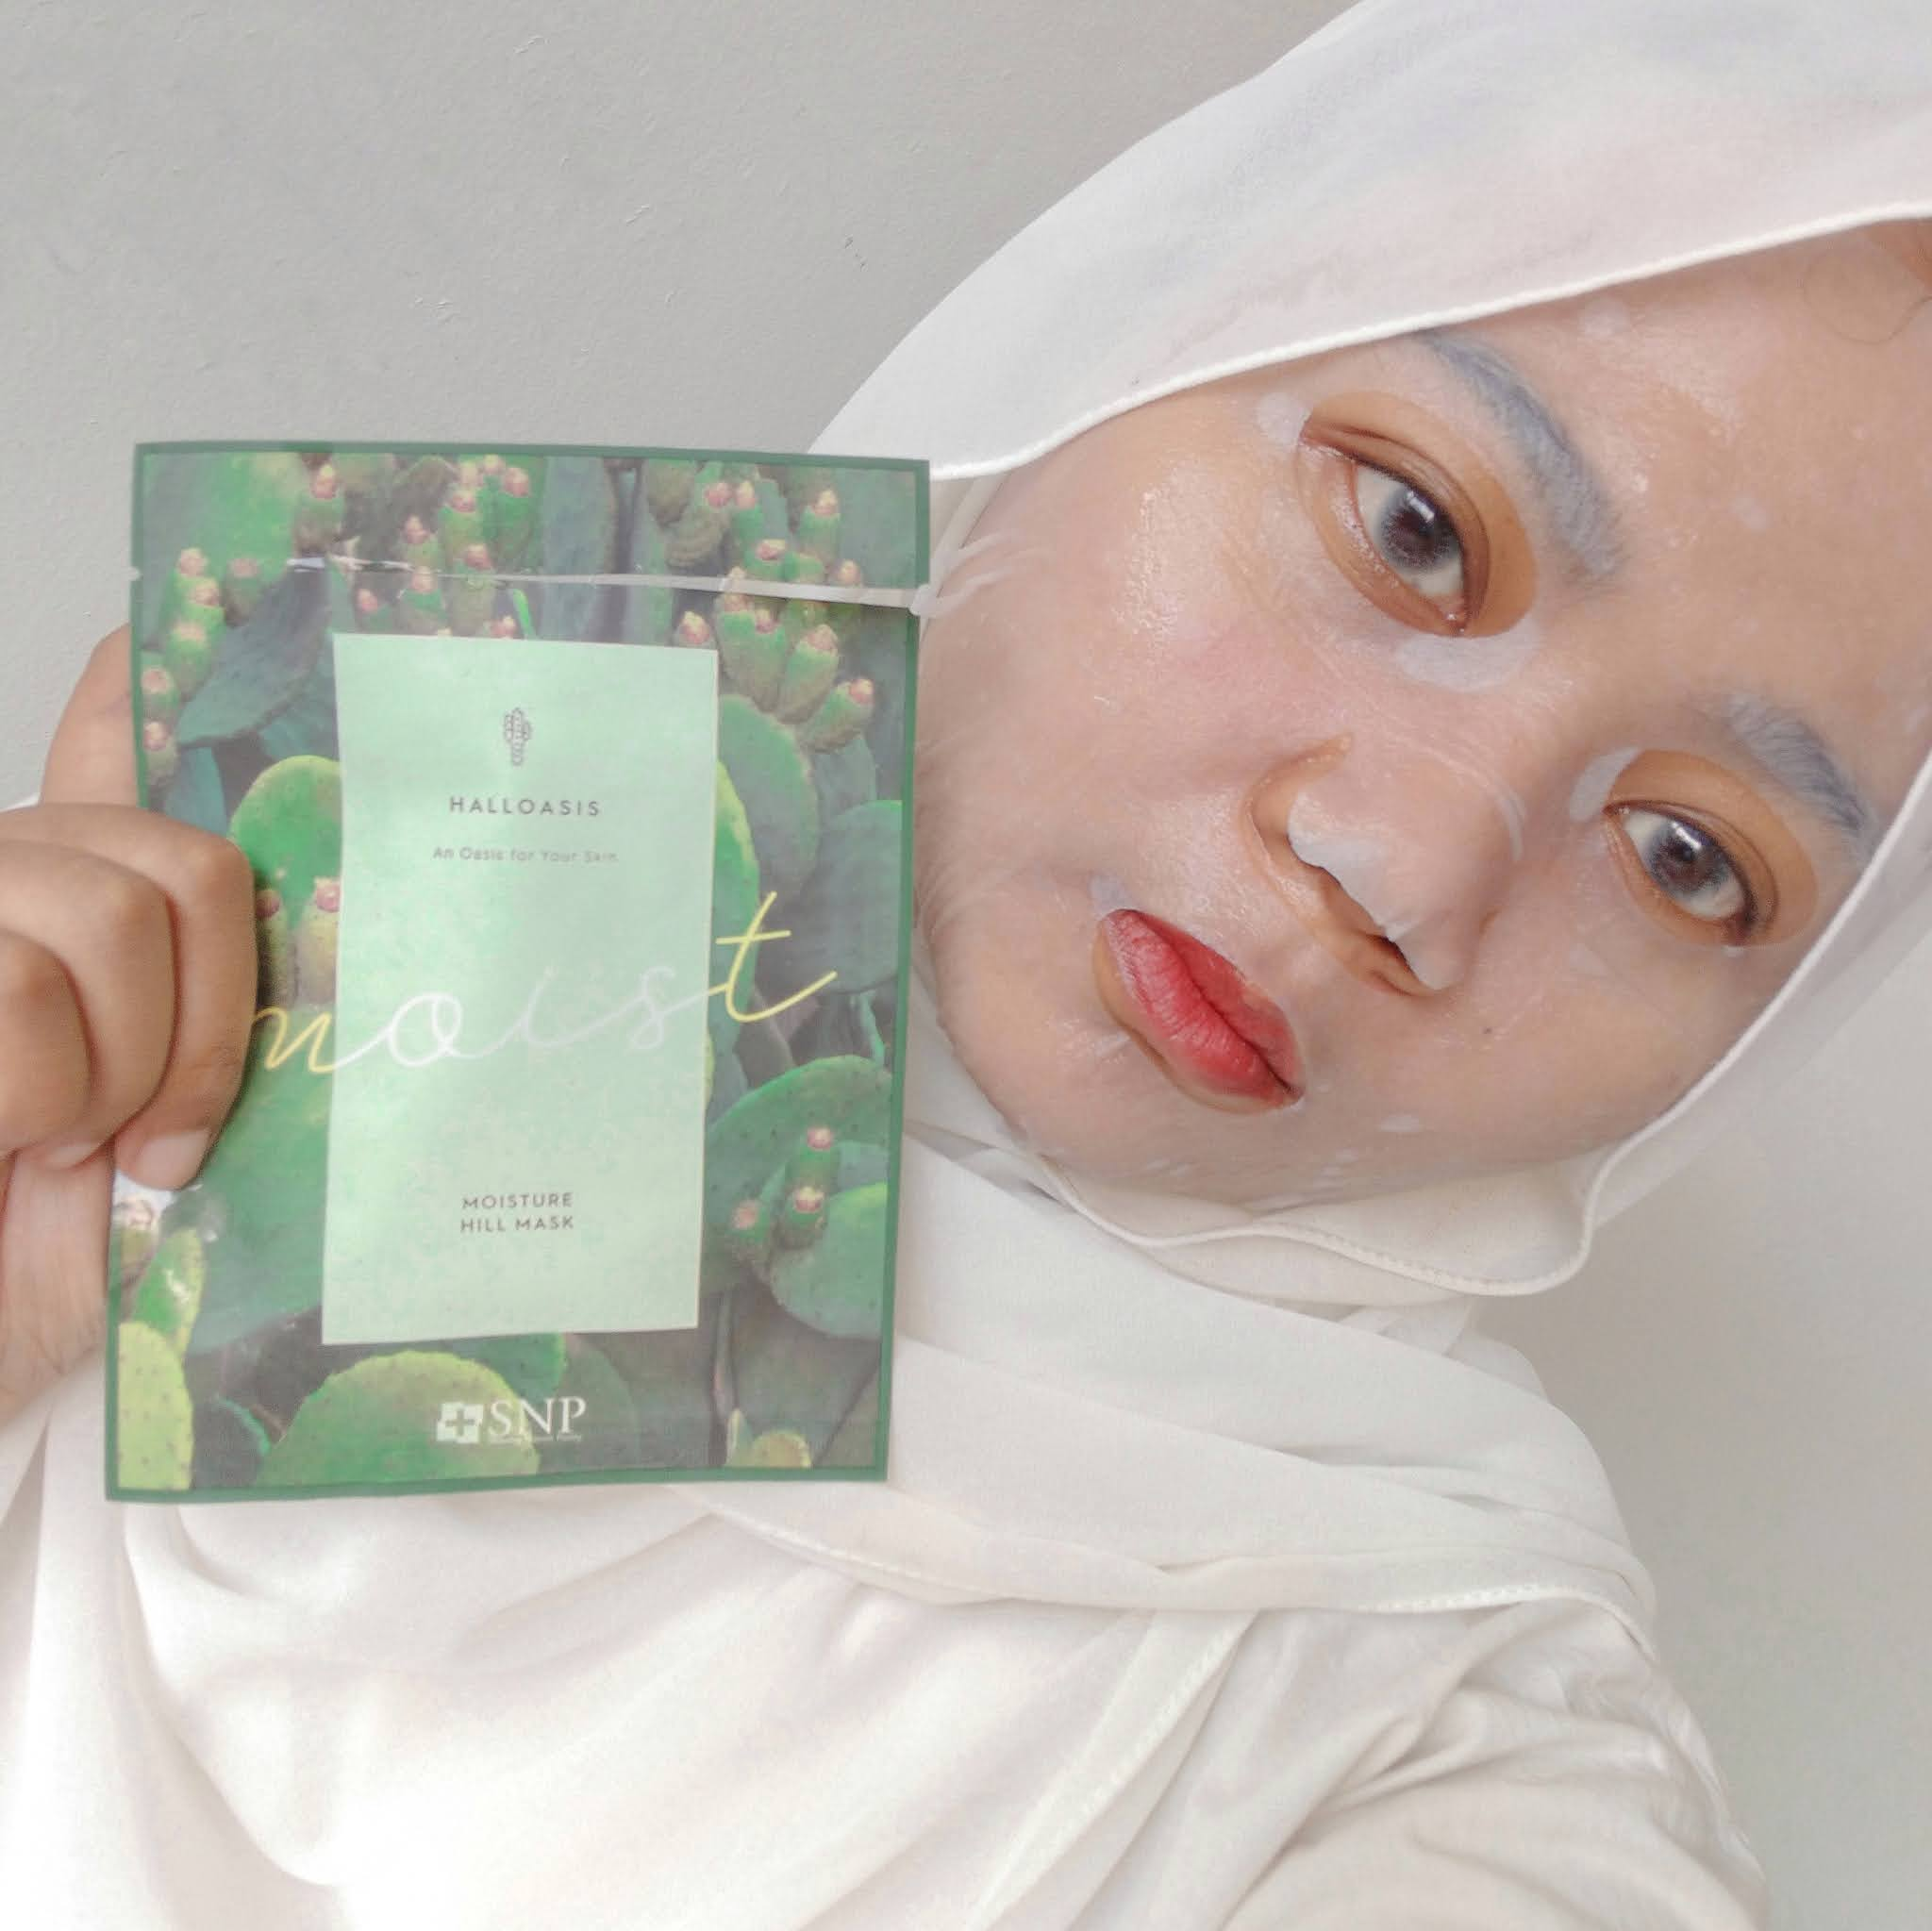 snp-halloasis-moisture-hill-mask